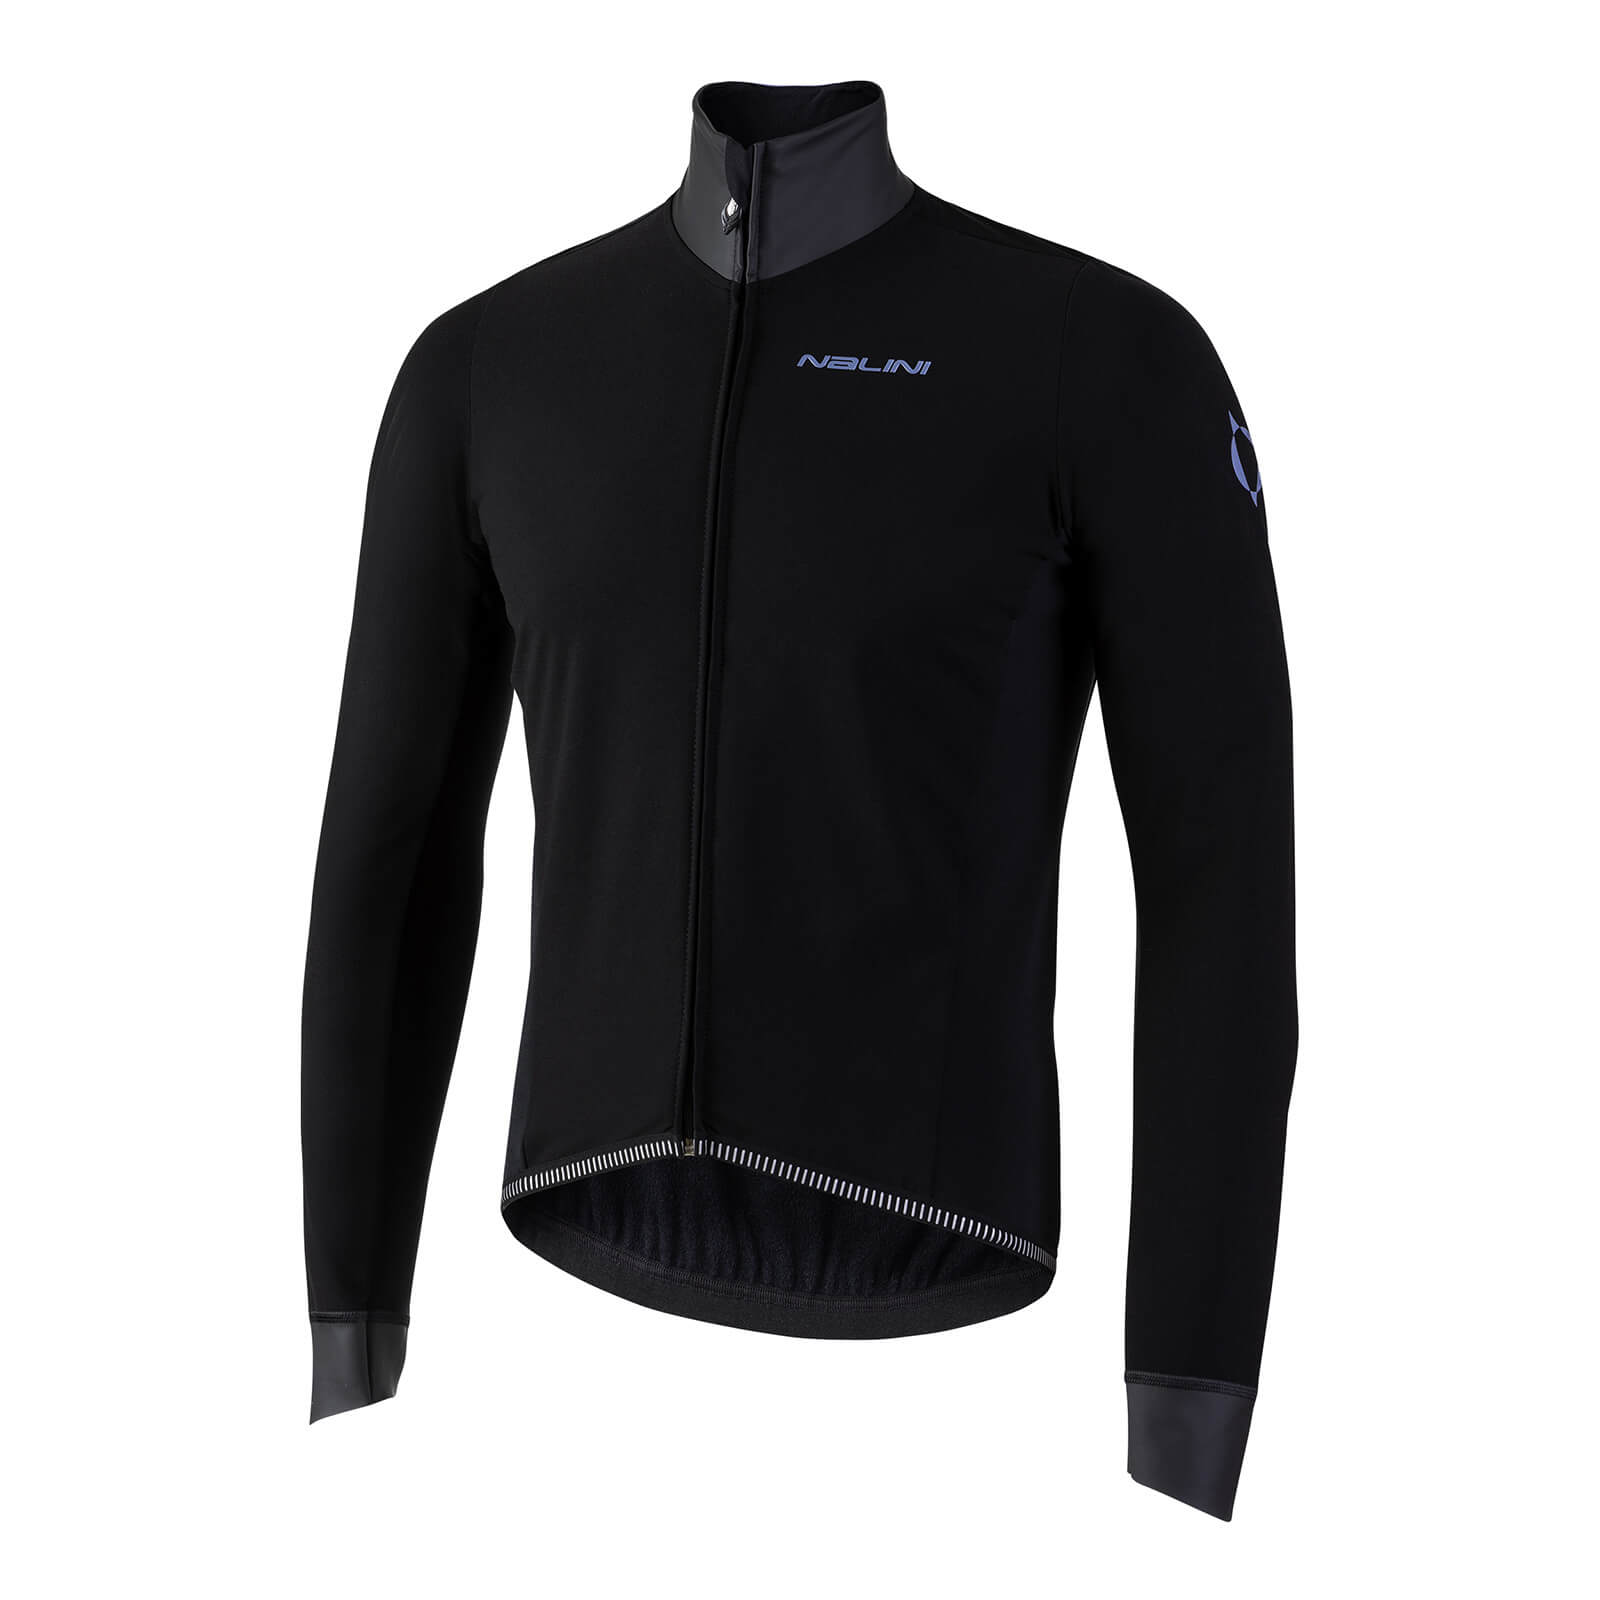 Nalini XWind 2.0 Wind Long Sleeve Jersey - Black